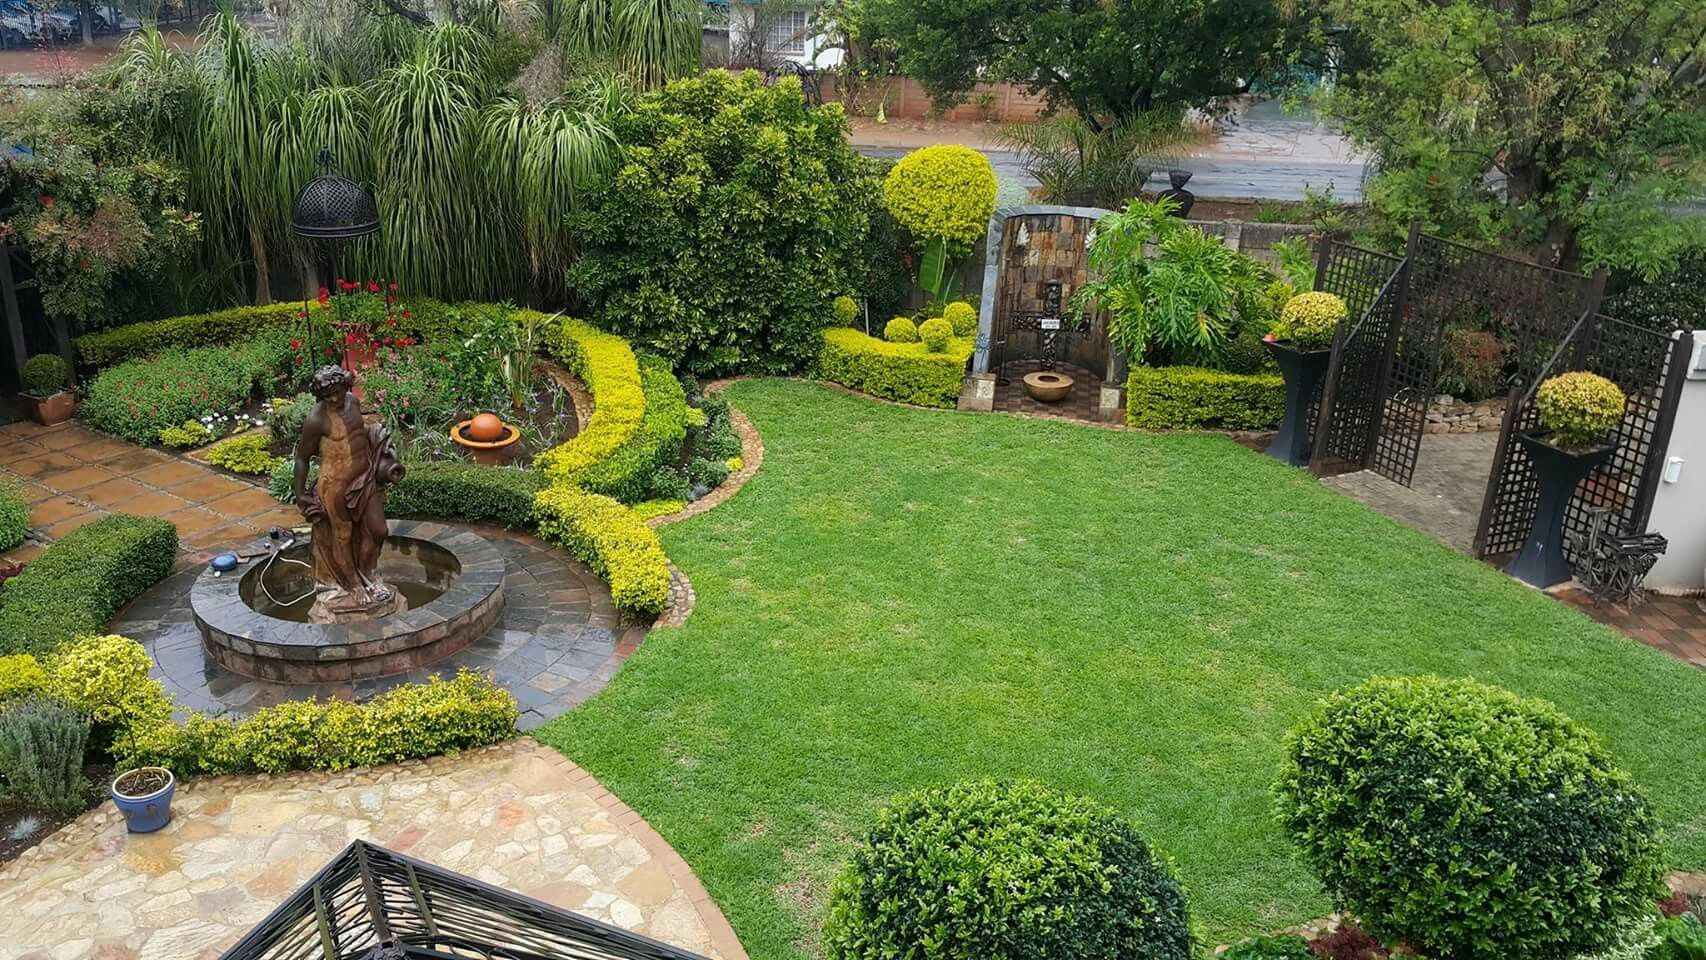 Garden By Designer Gardens Landscaping Www Designergardenlandscaping Co Za In Centurion Pretoria Gauteng Garden Design Beautiful Gardens Garden Landscaping